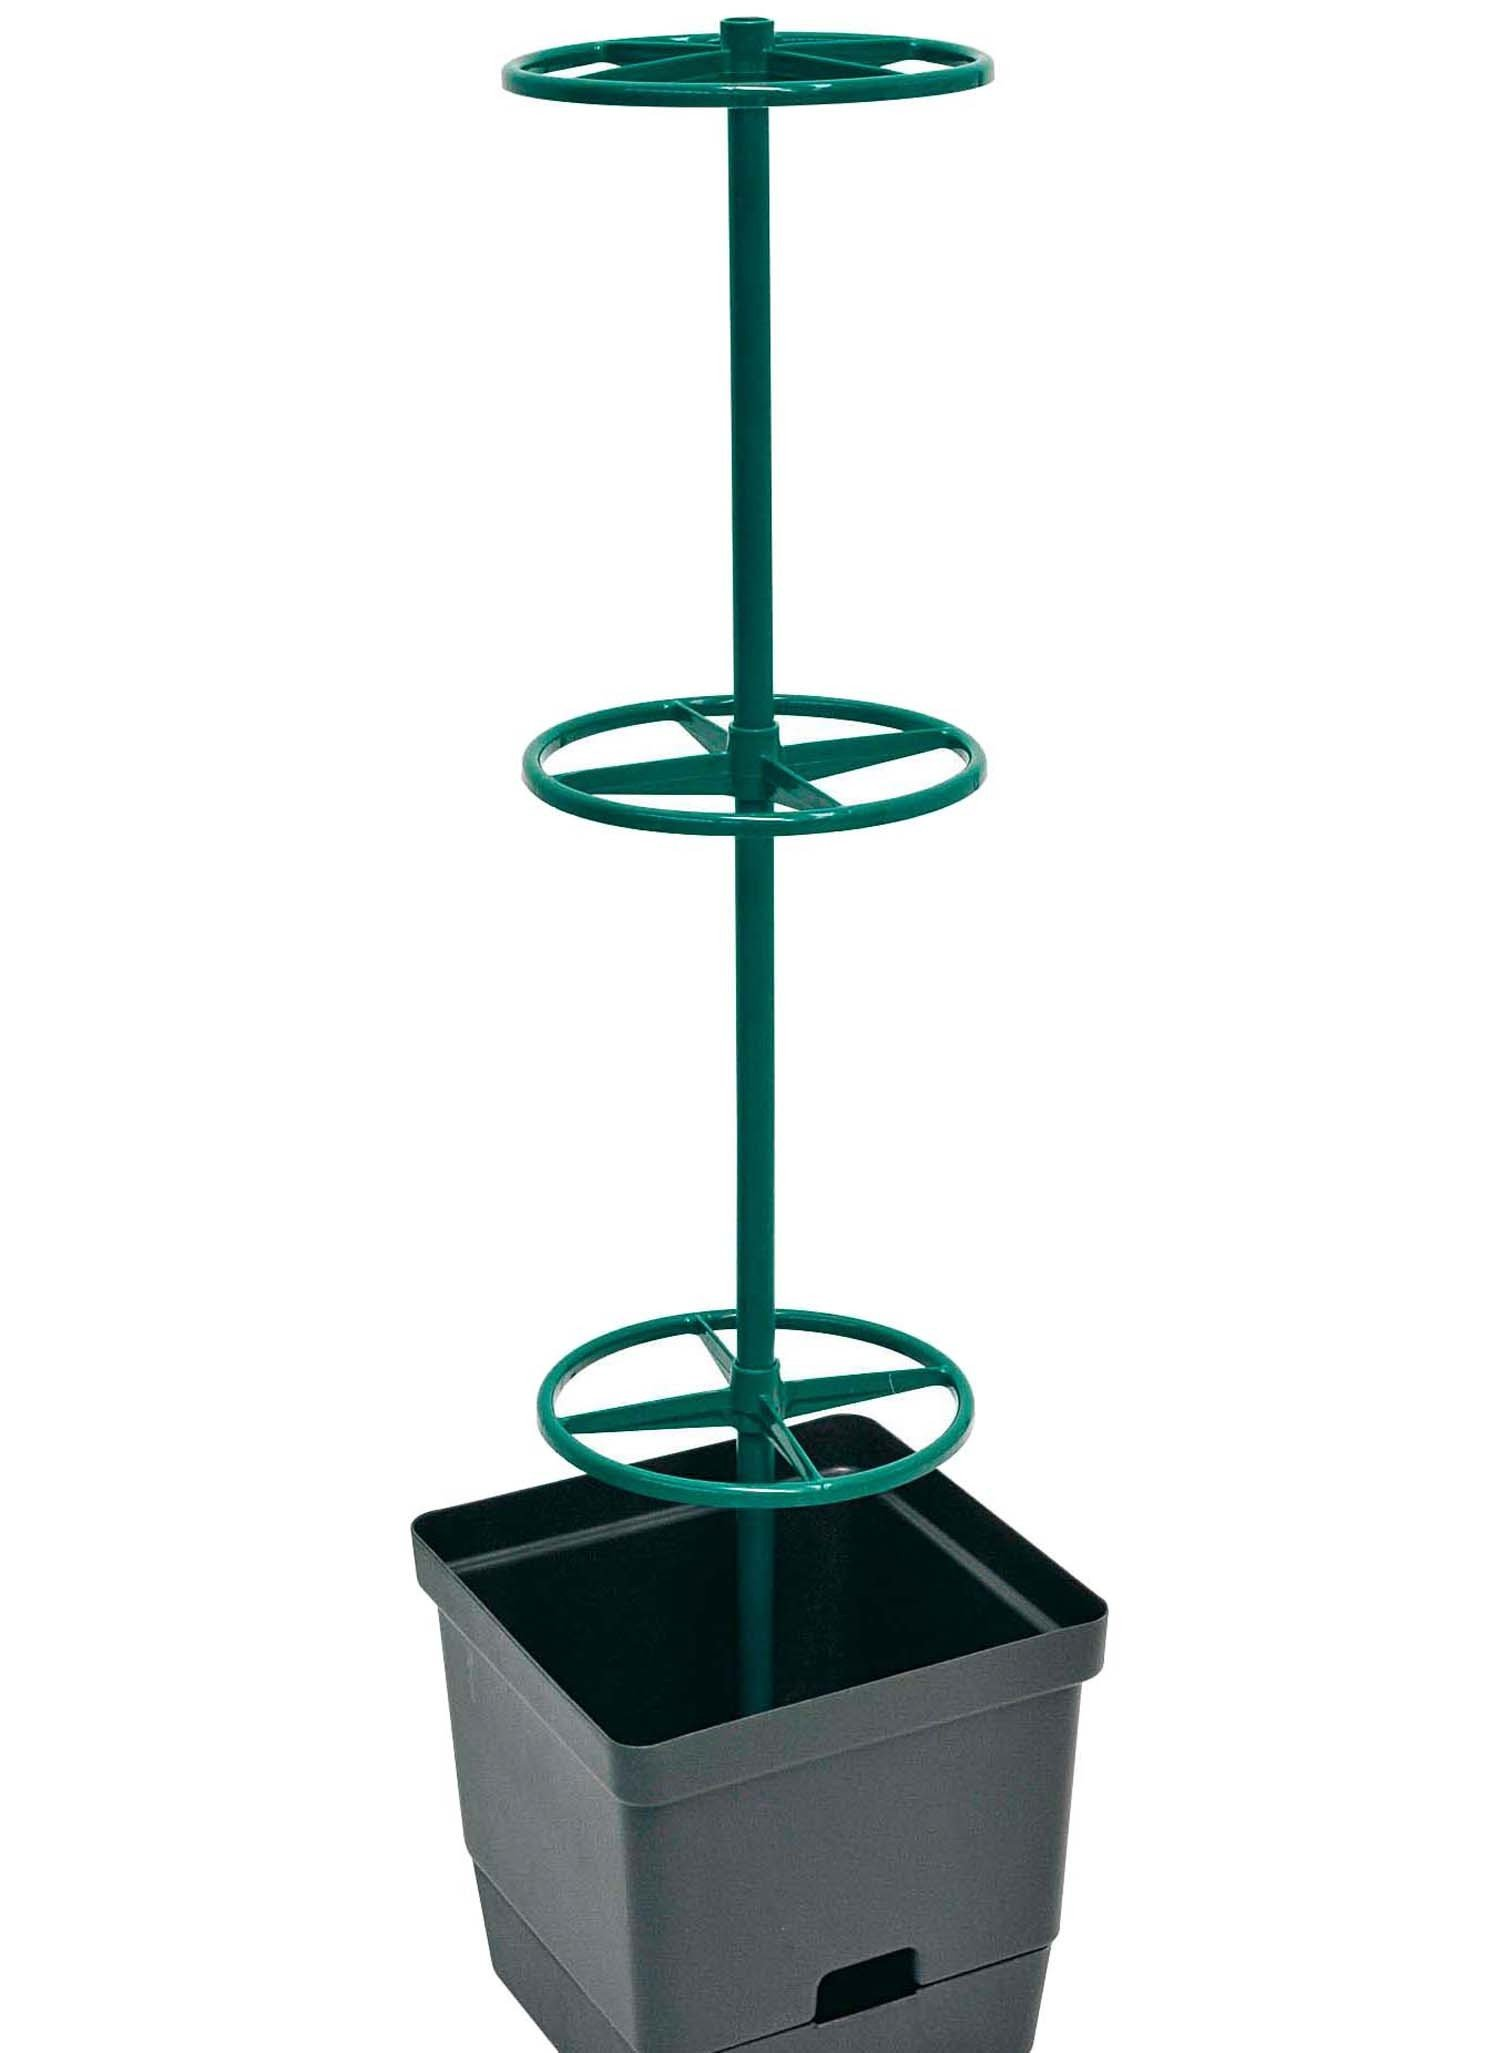 Kletterpflanzen 28x28cm H107cm - 2 - Ronja.ch